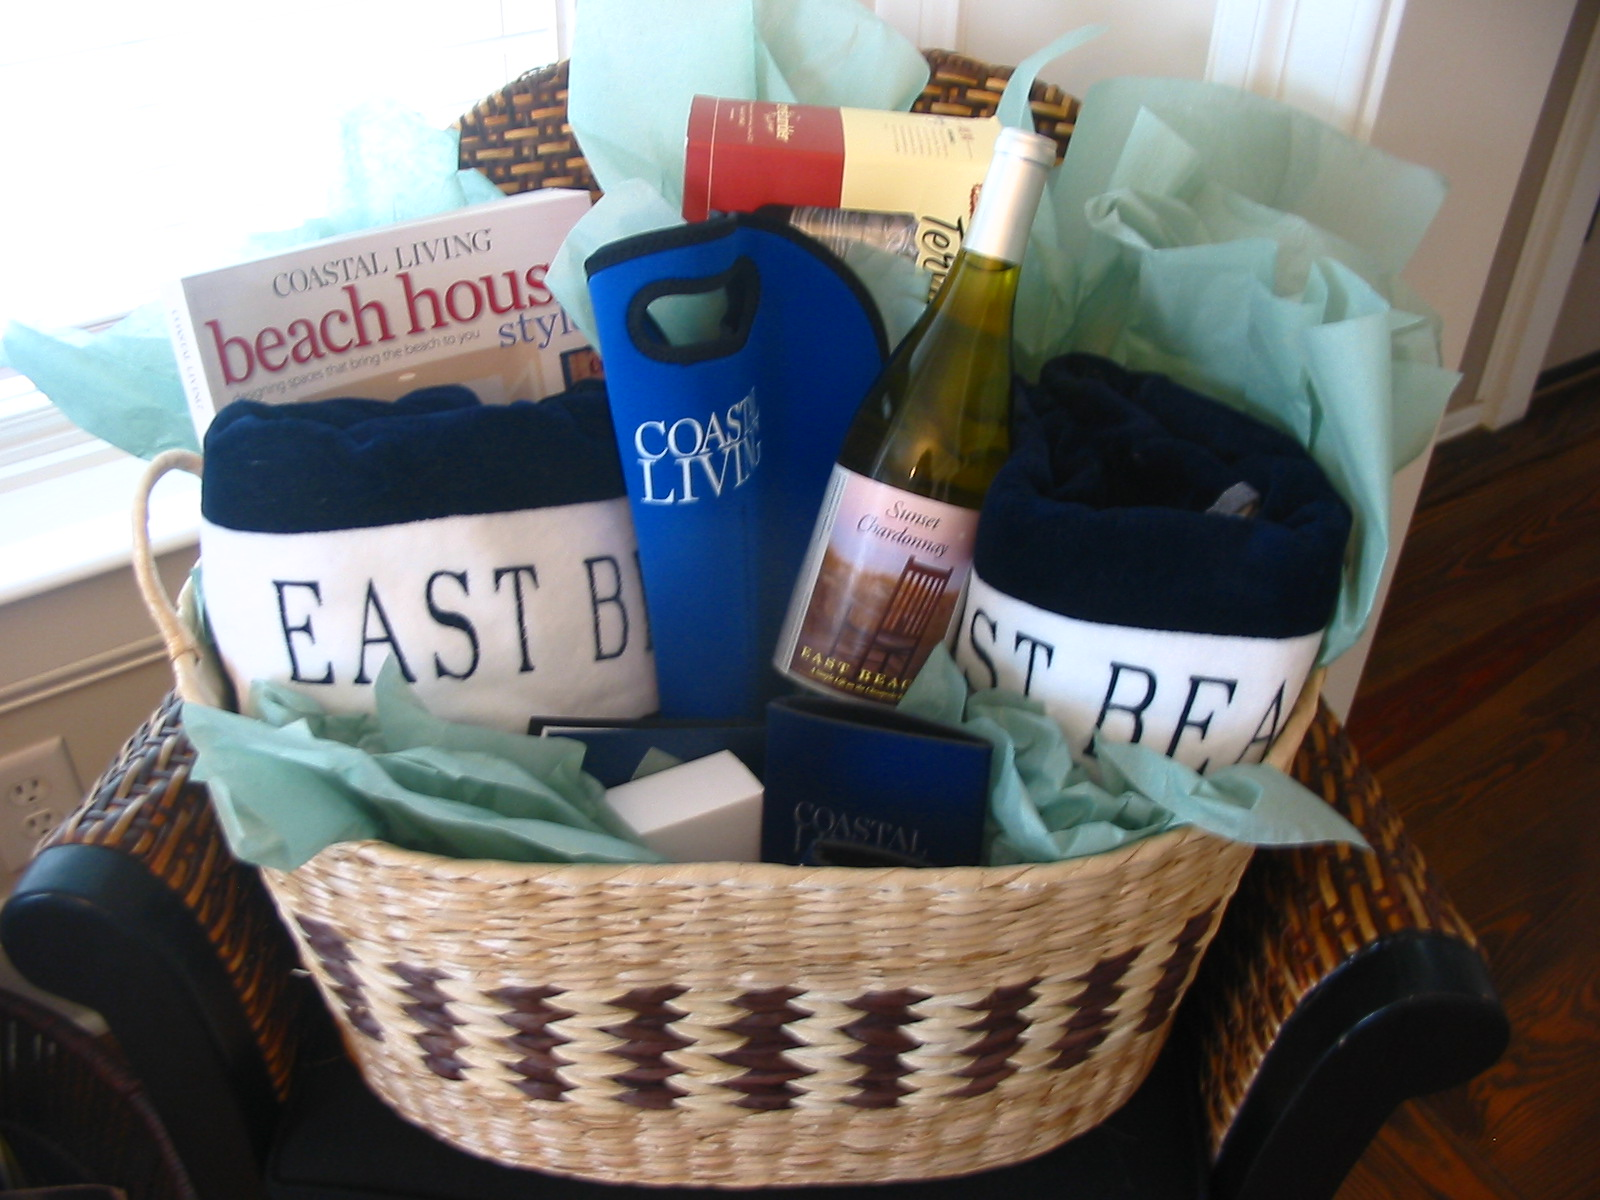 August Coastal Living Ultimate Beach House Gift Basket Winner